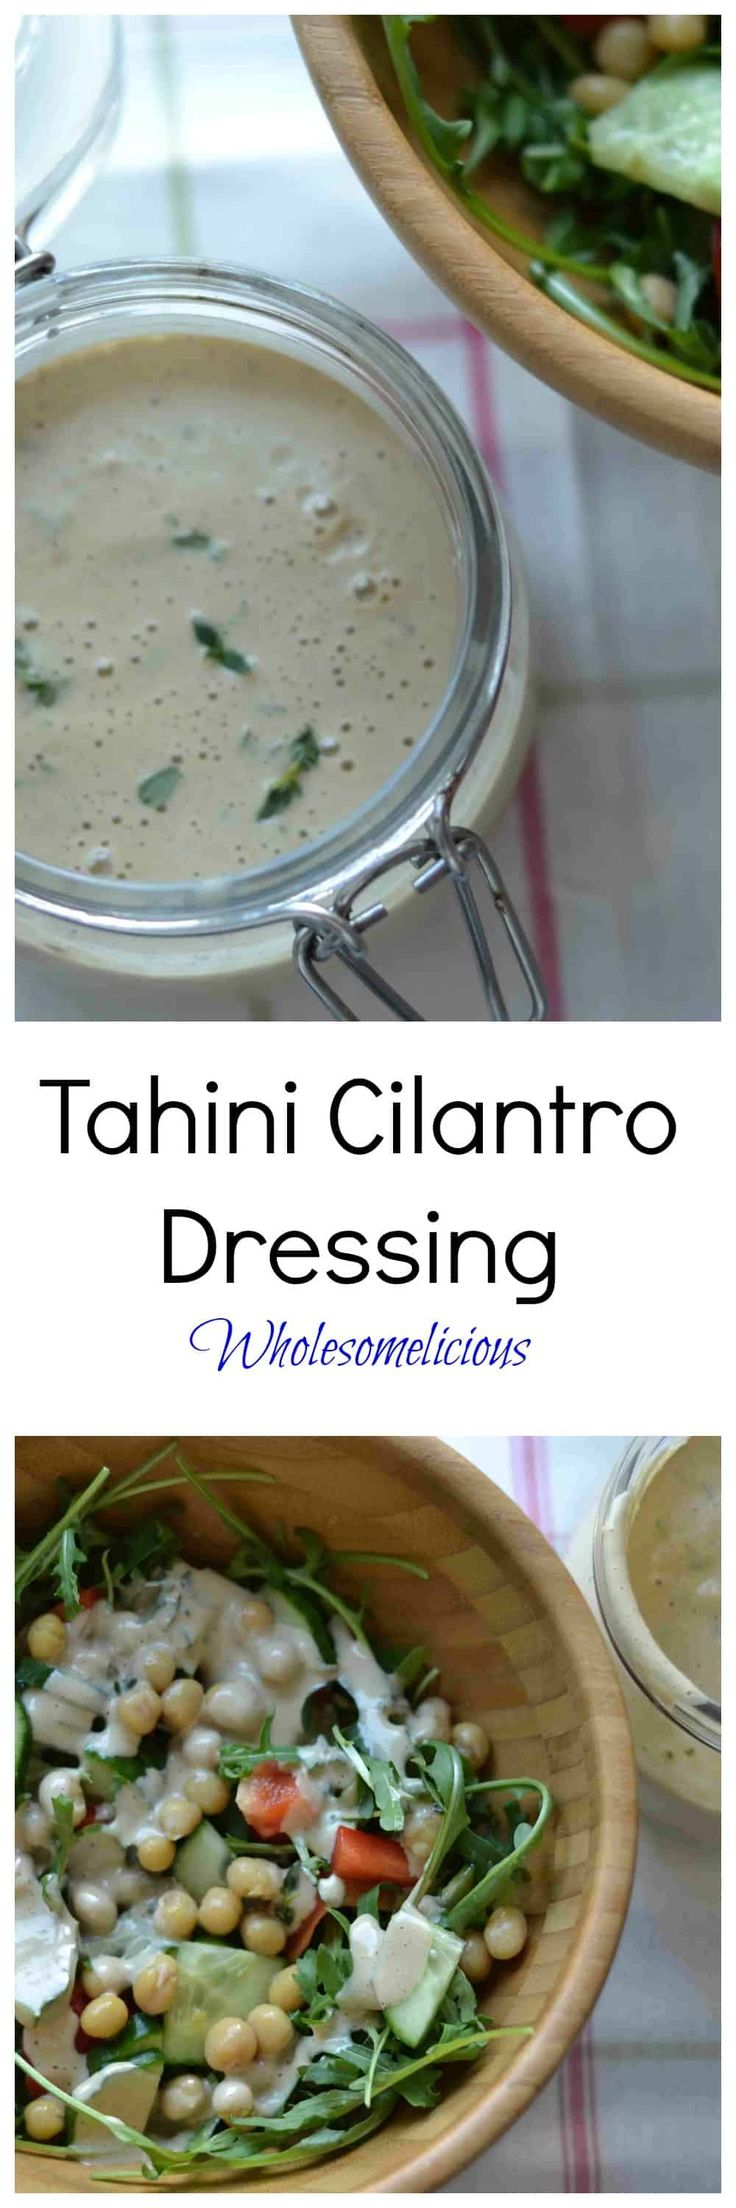 Tahini Cilantro Dressing Pin